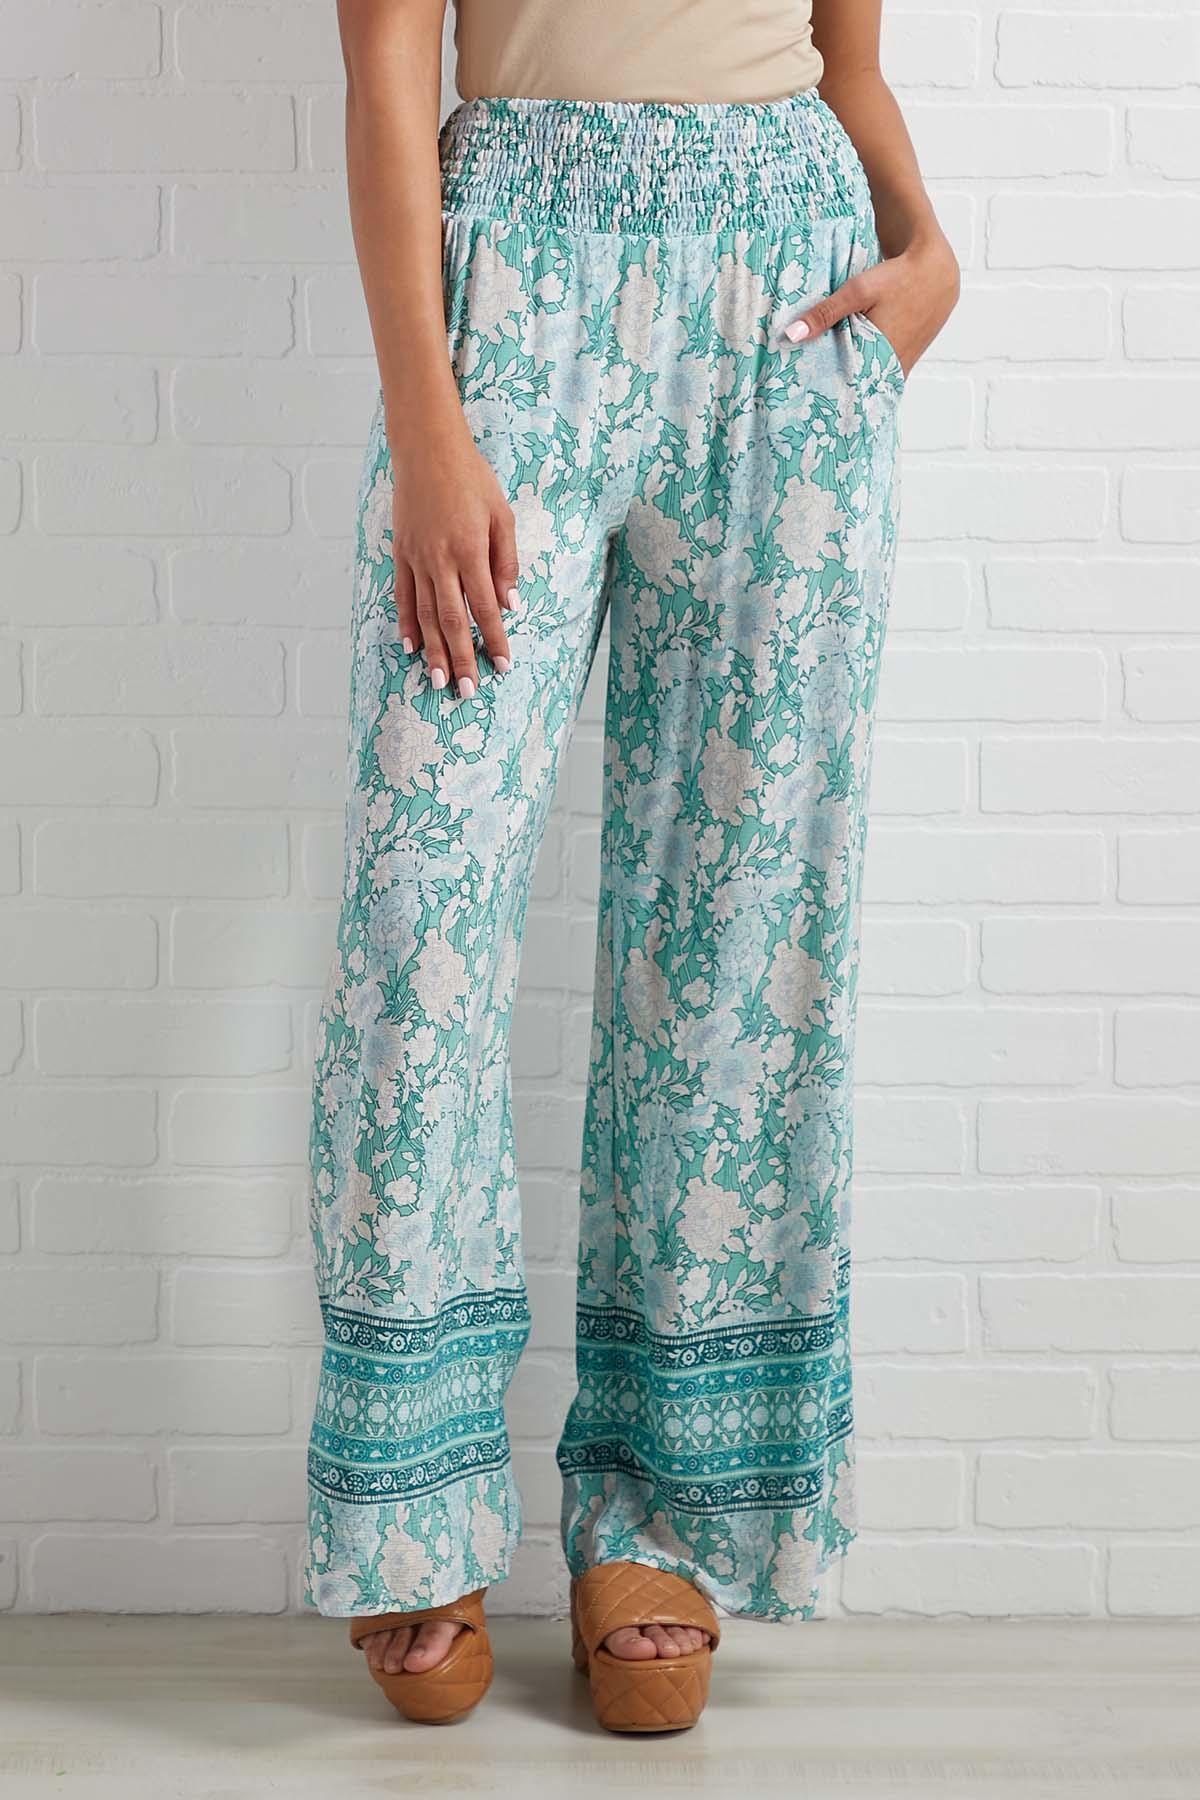 Four Leaf Clover Pants